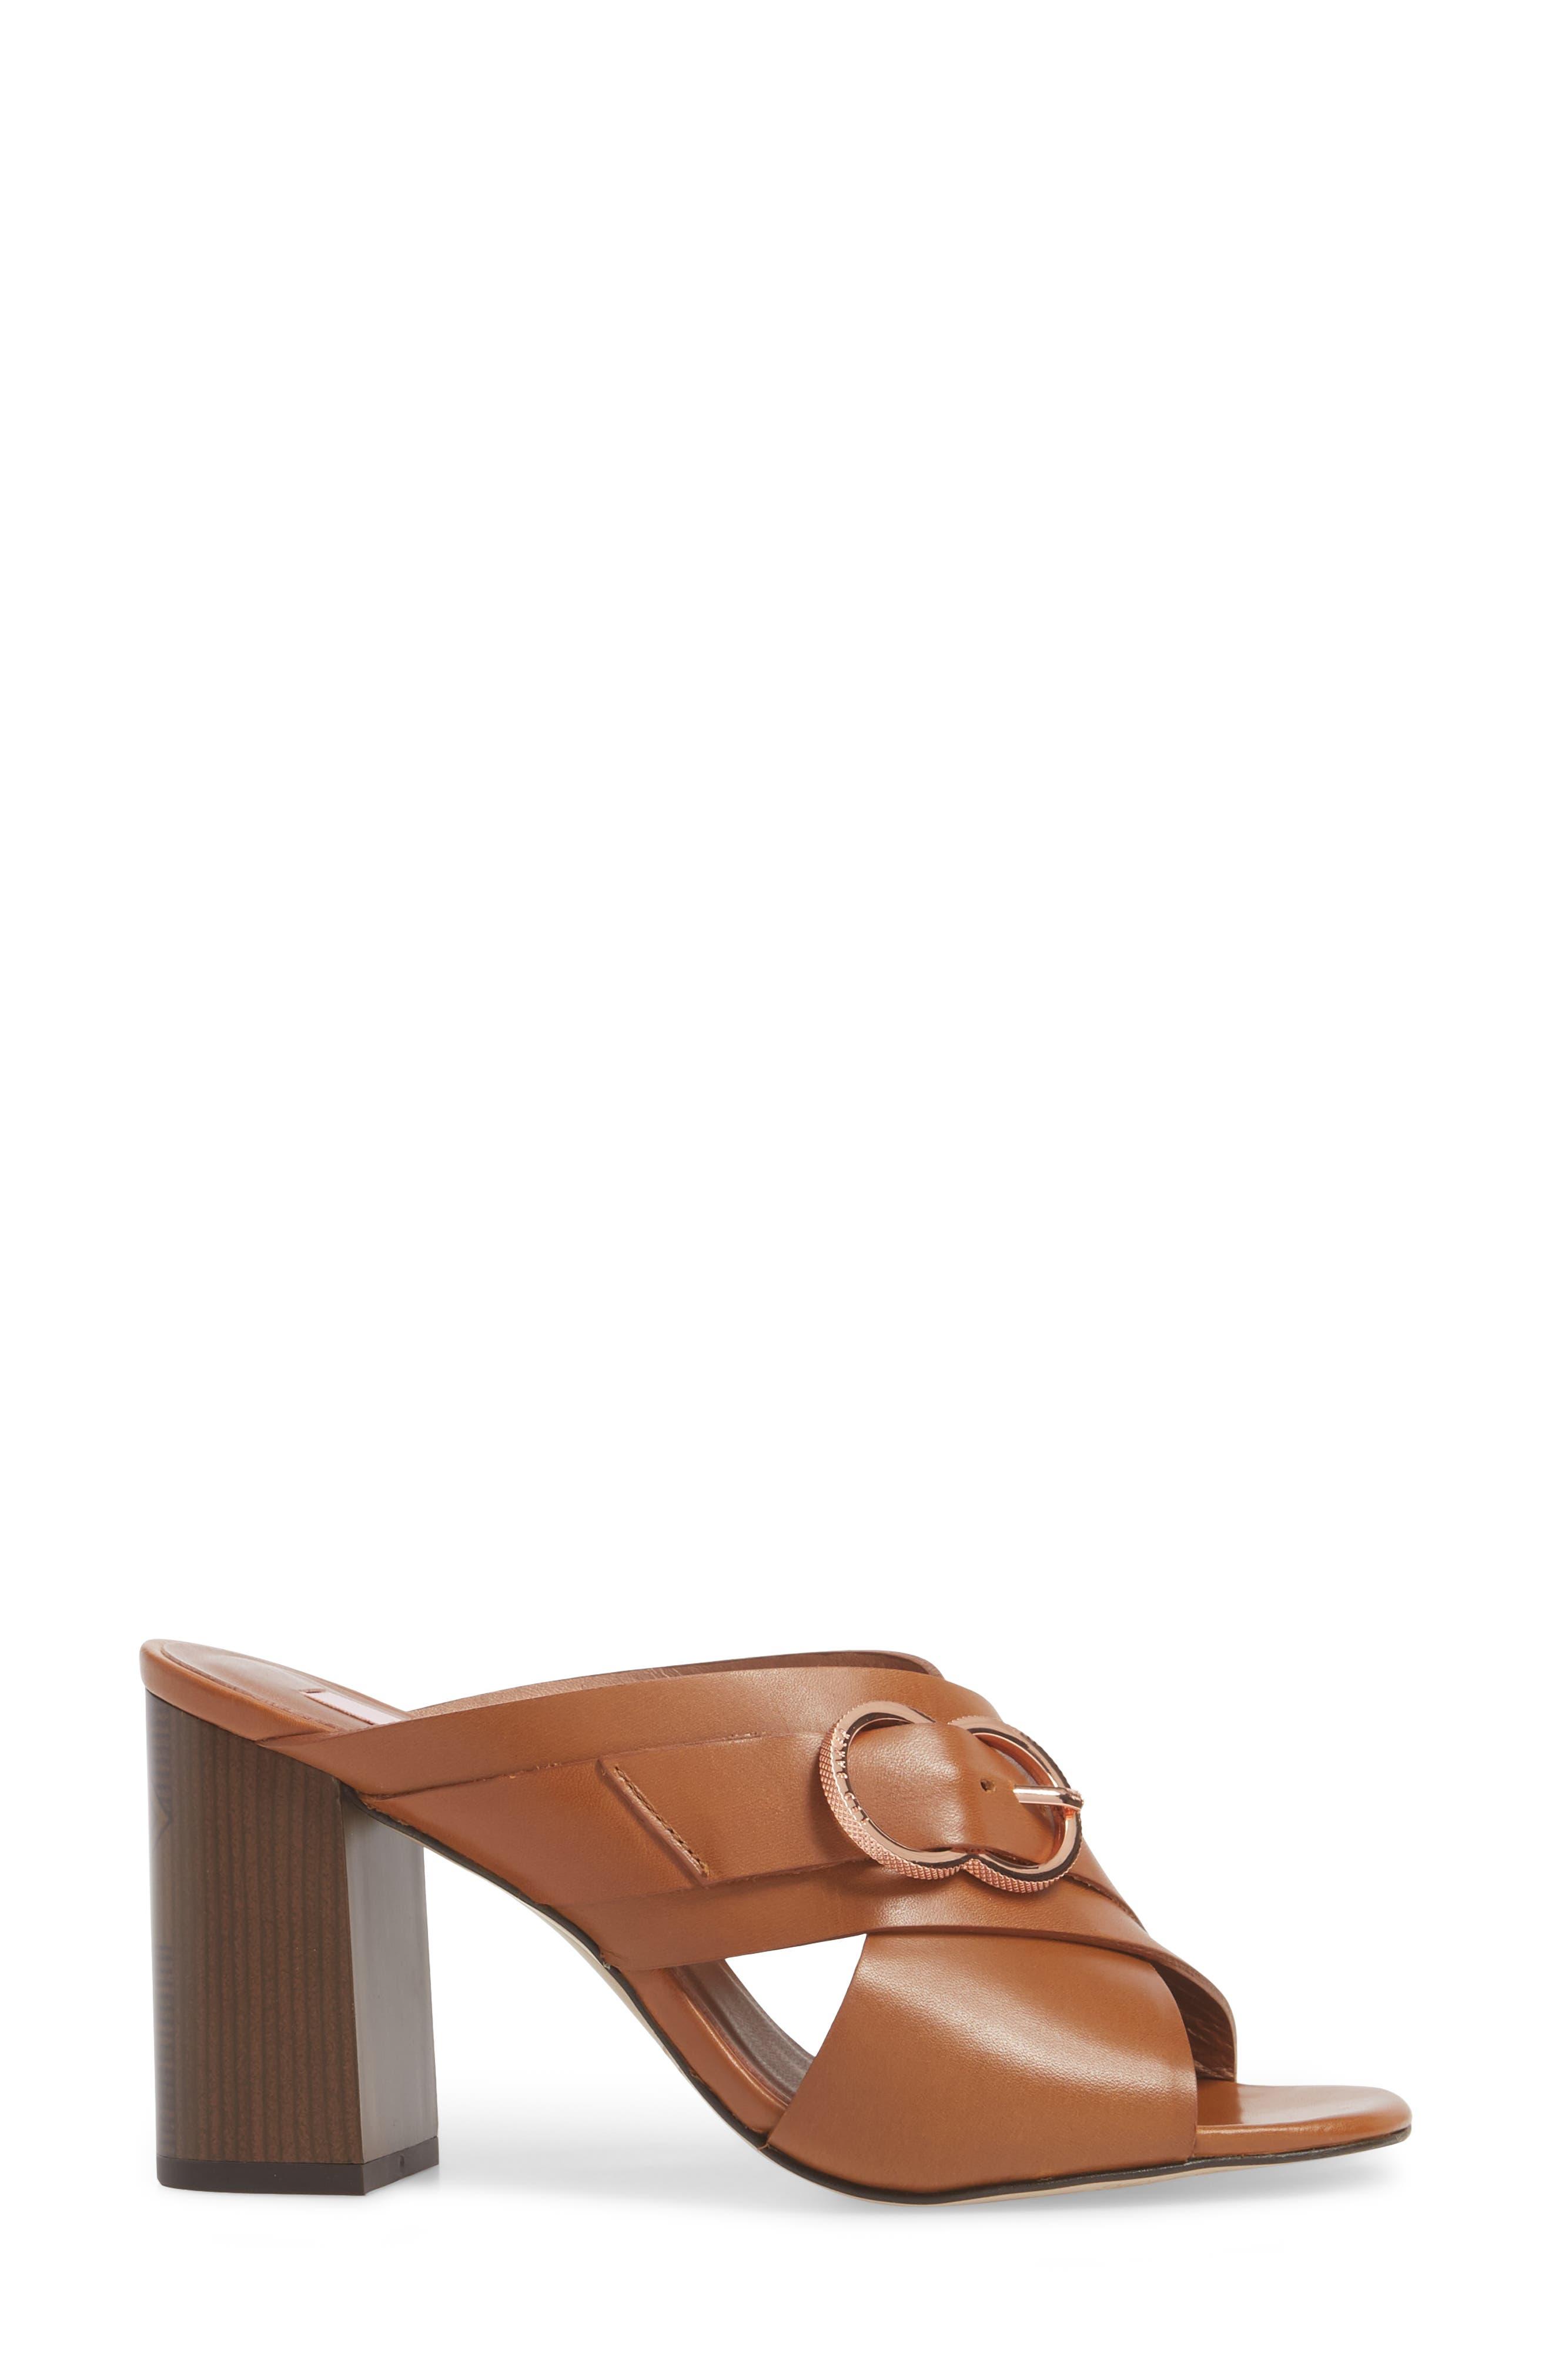 Maladas Slide Sandal,                             Alternate thumbnail 3, color,                             Tan Leather